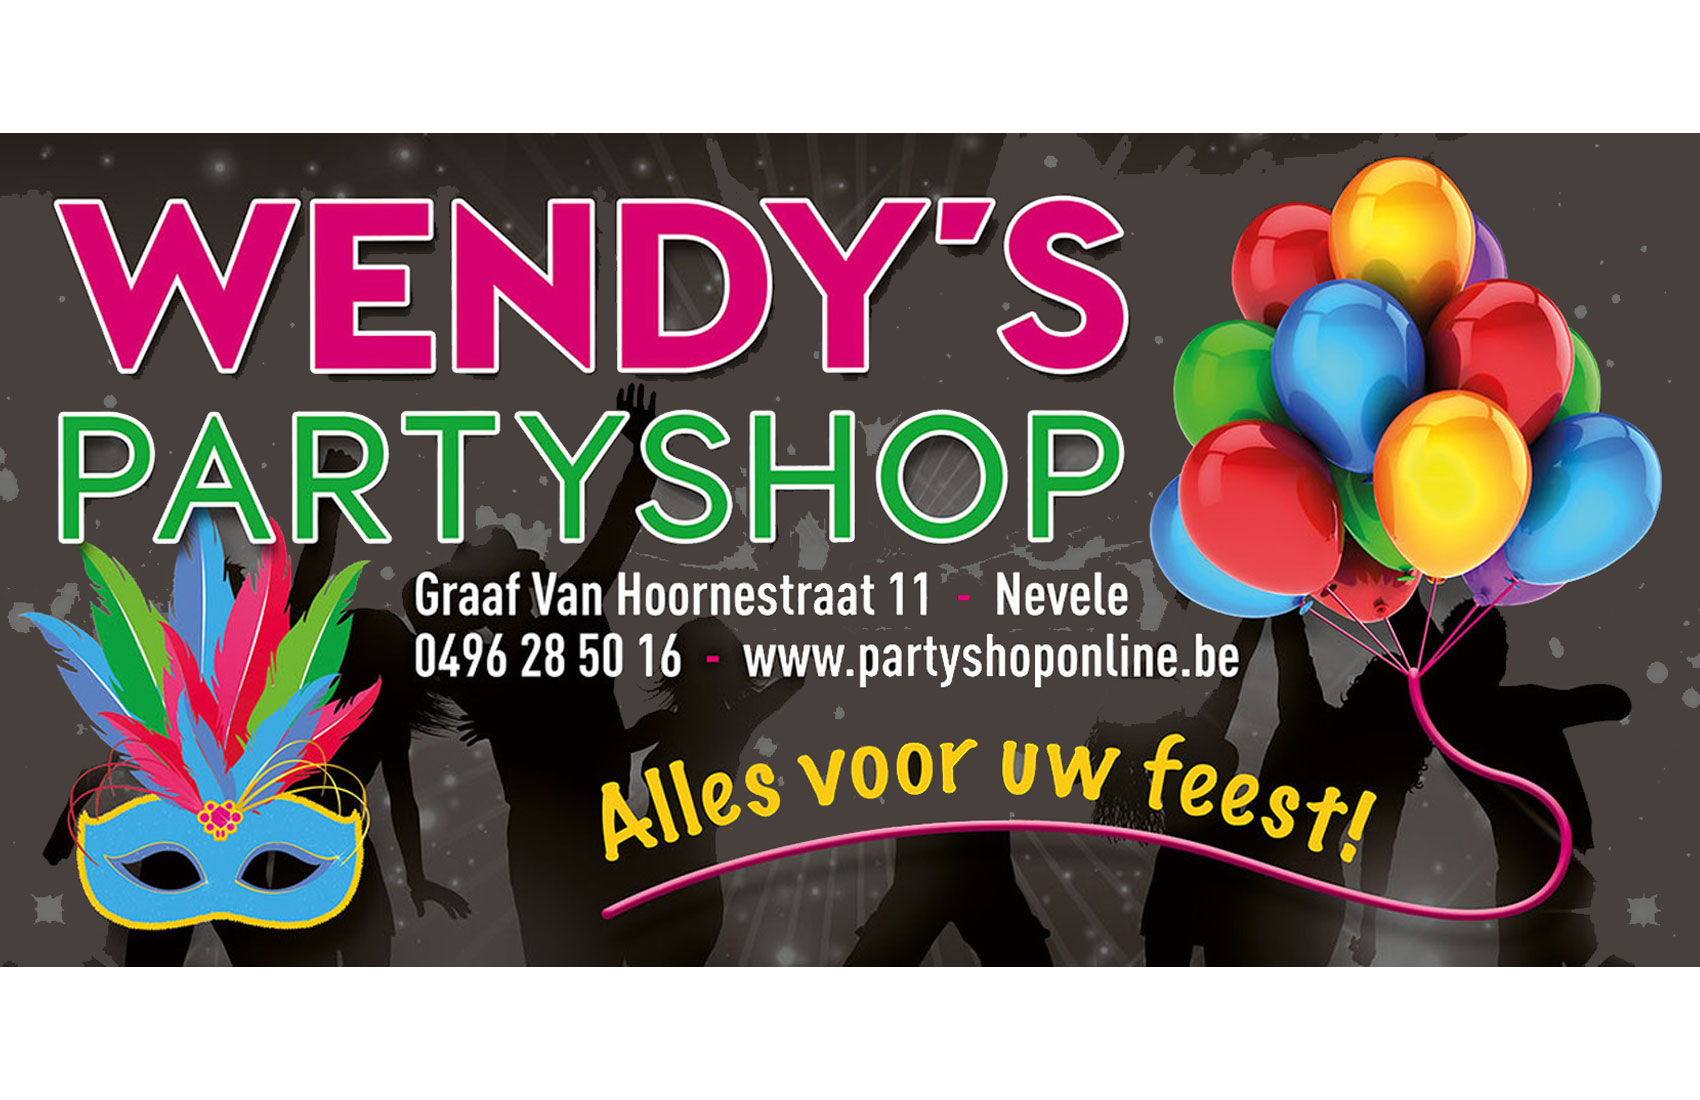 Wendy's Partyshop